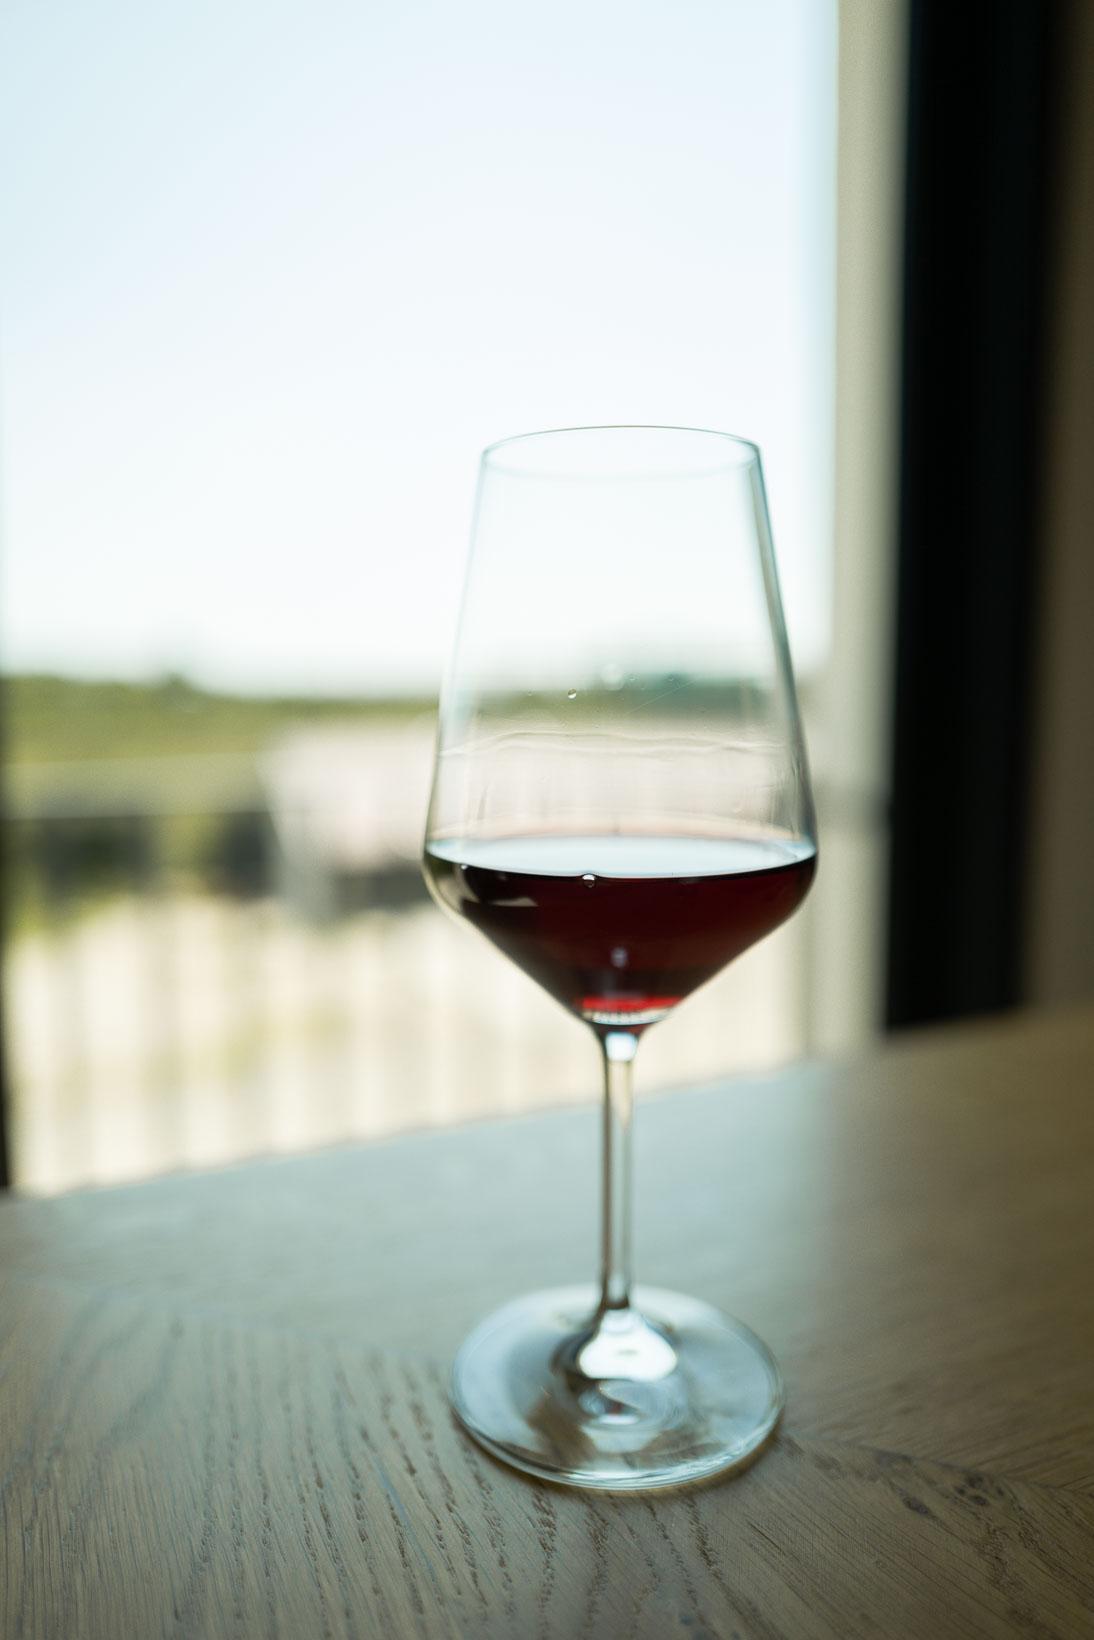 sauro-maule-wines-Q1030260_p_lr_web